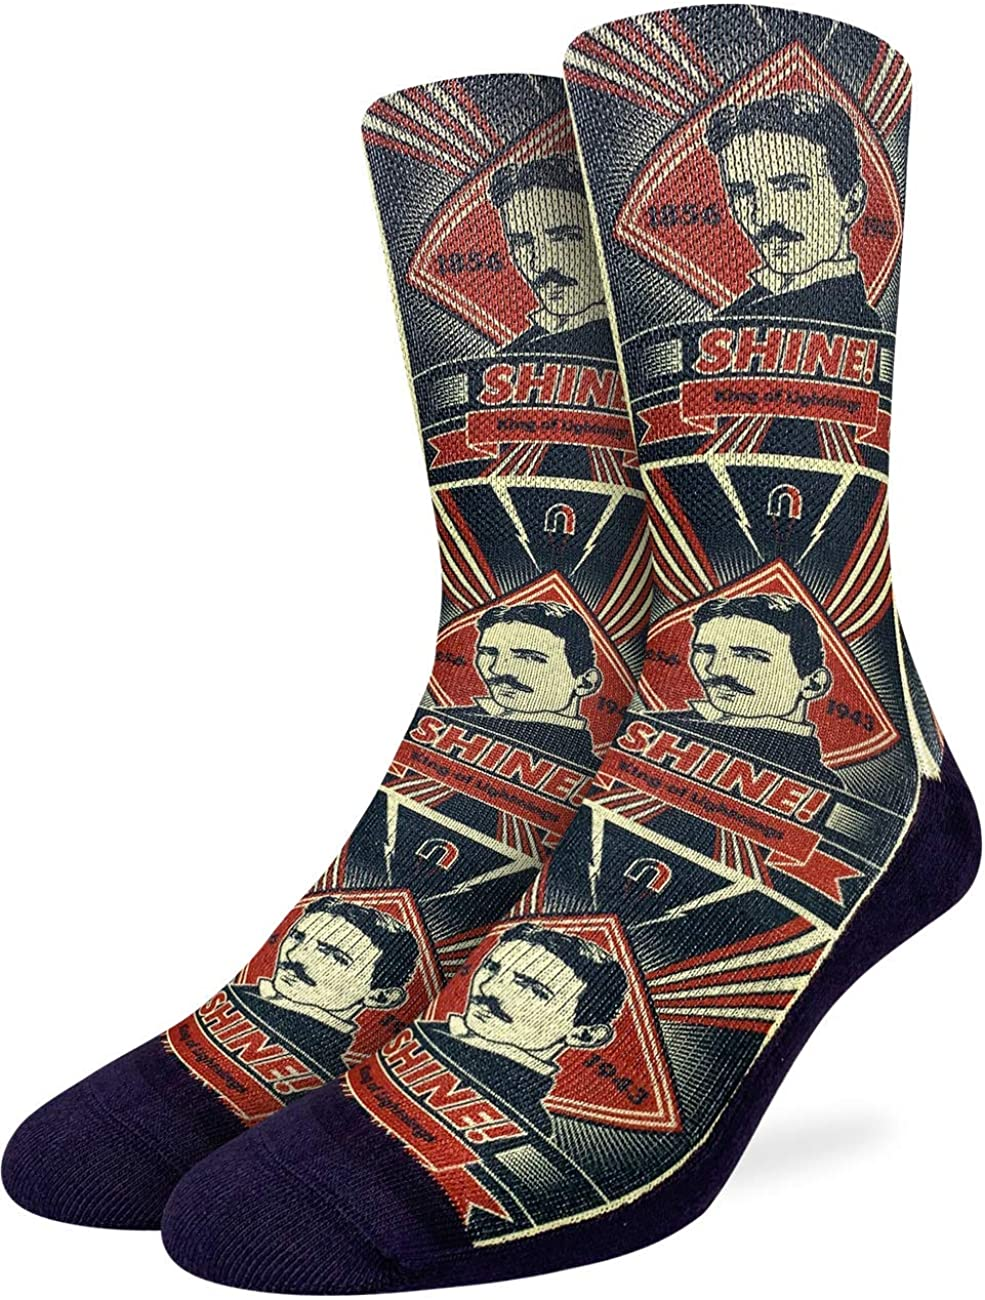 Good Luck Sock Men's Nikola Tesla Socks - Red, Adult Shoe Size 8-13